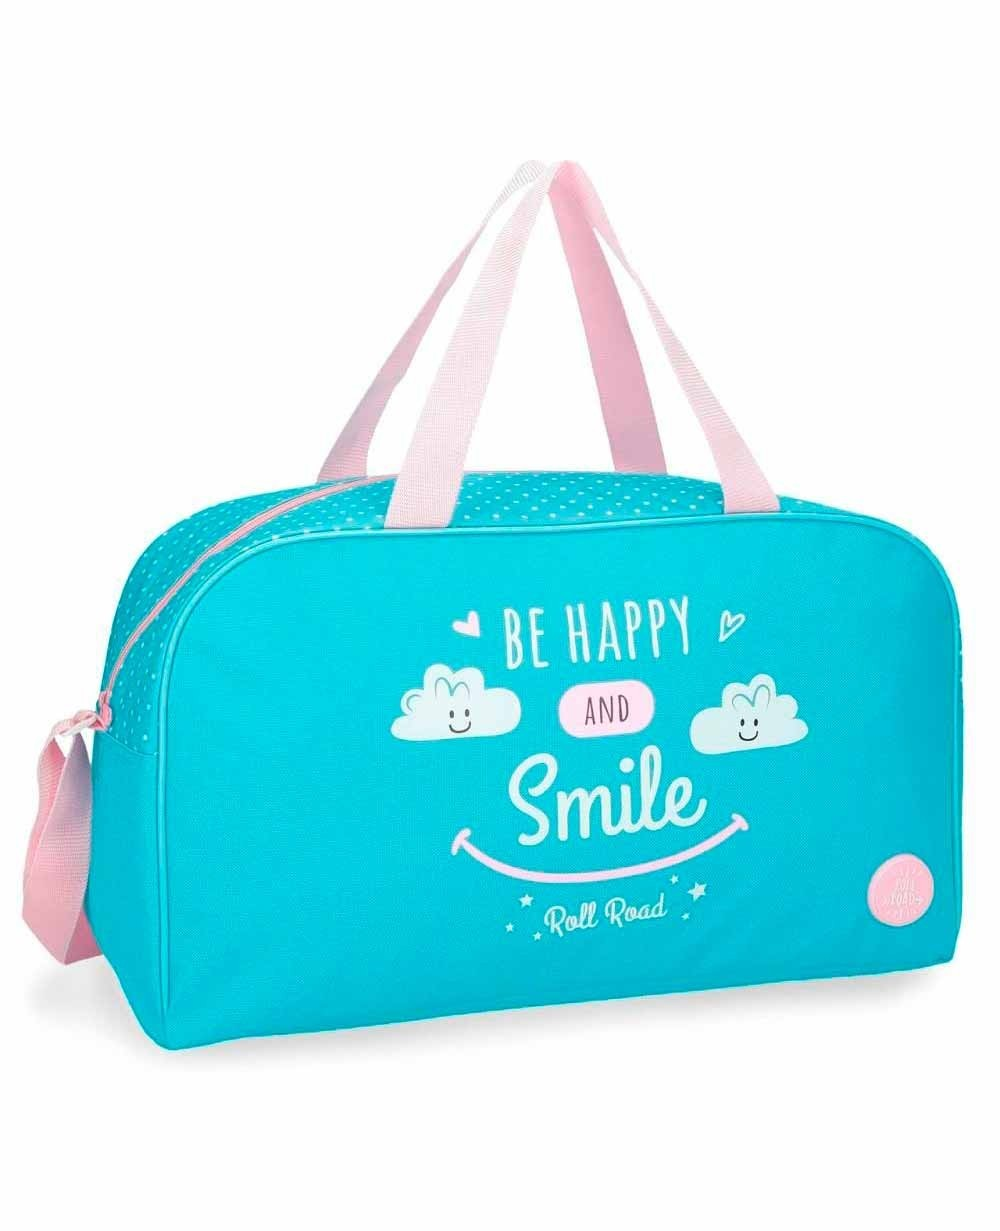 https://www.bolsoshf.com/ficheros/productos/bolsa-de-viaje-rollroad-happy.jpg